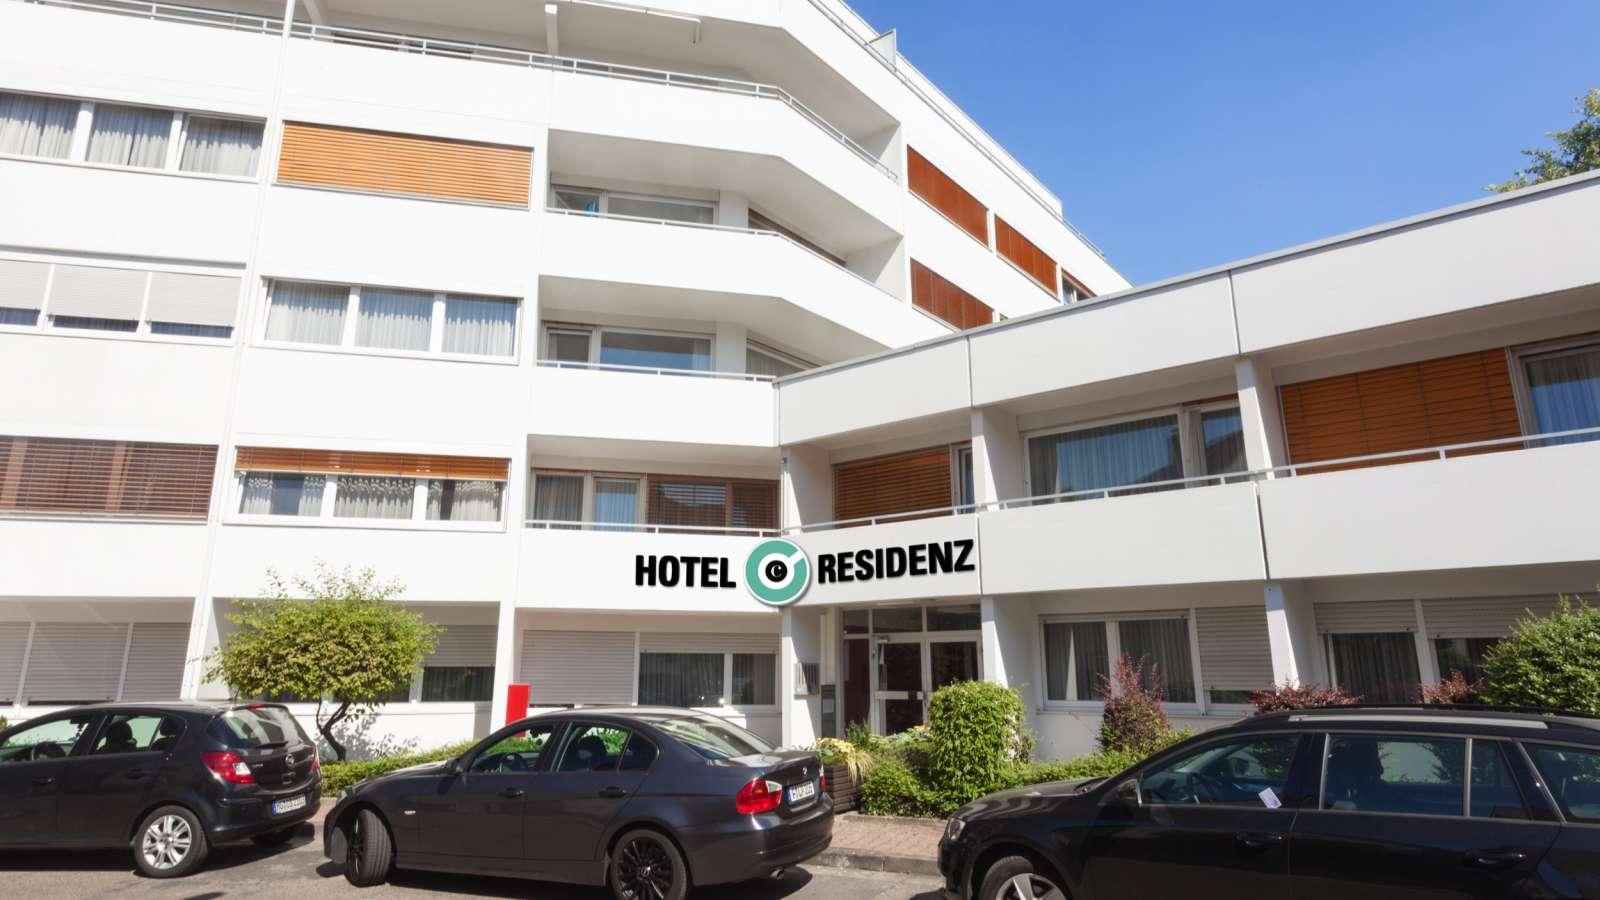 Centro hotels frankfurt am main for Hotel centro